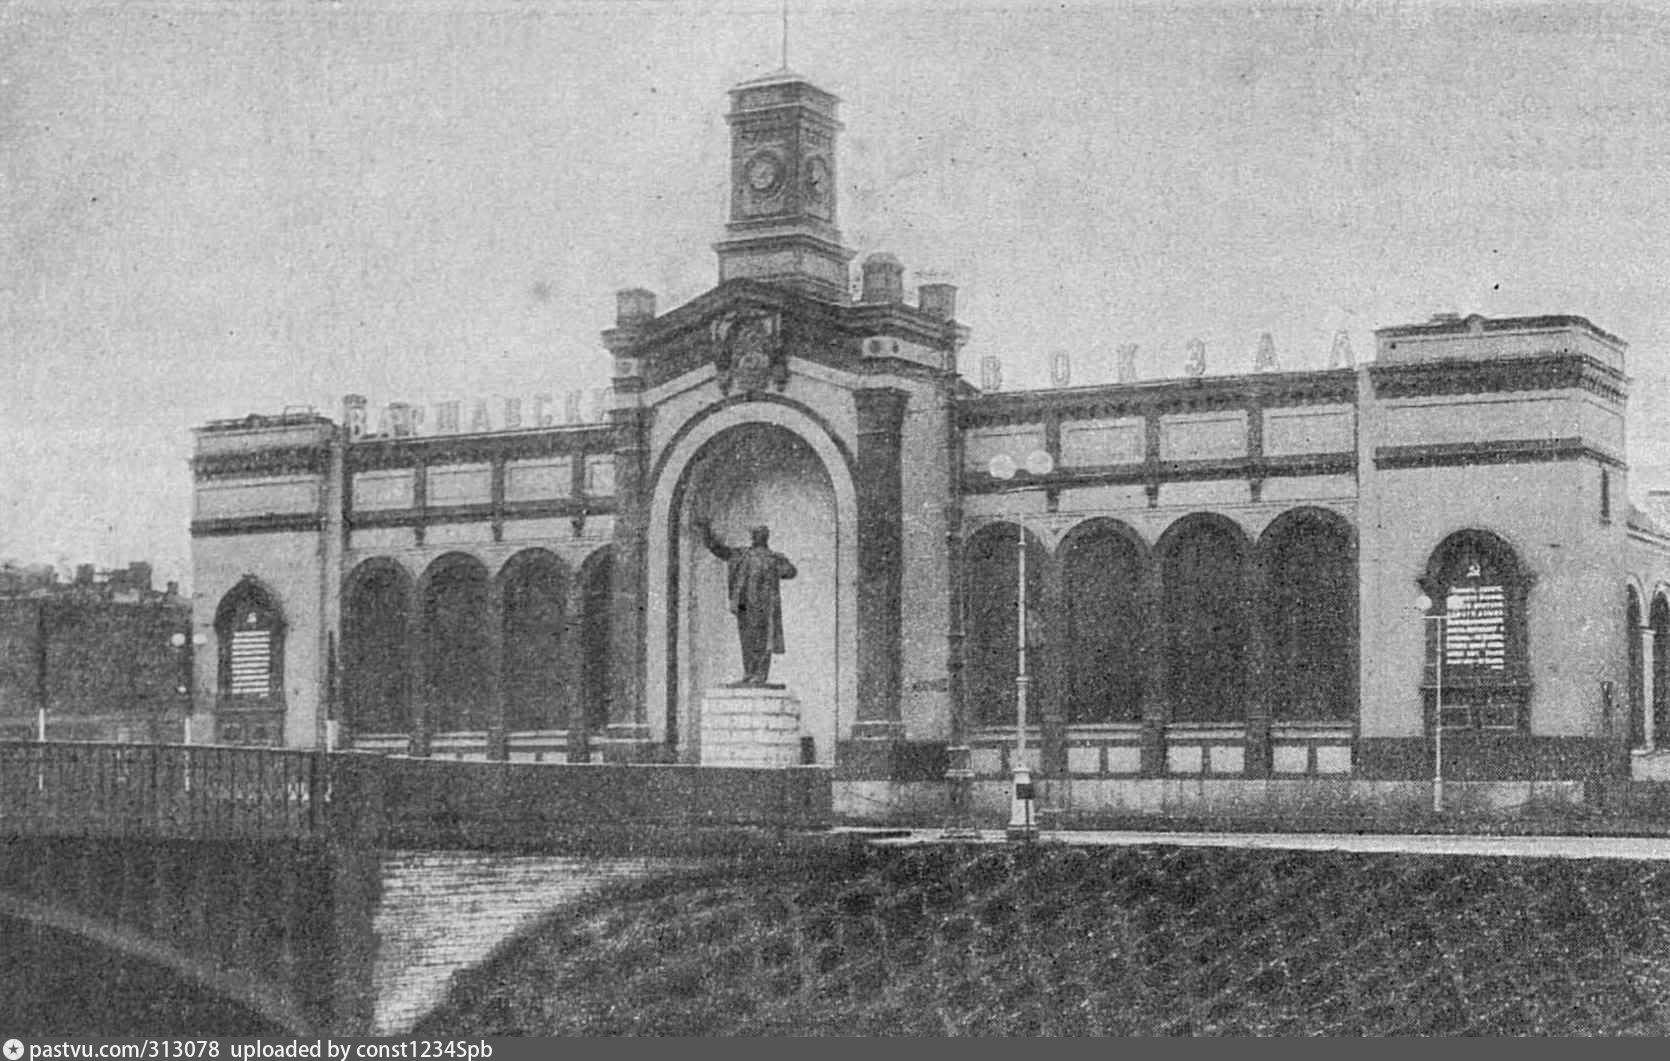 Варшавский вокзал картинки